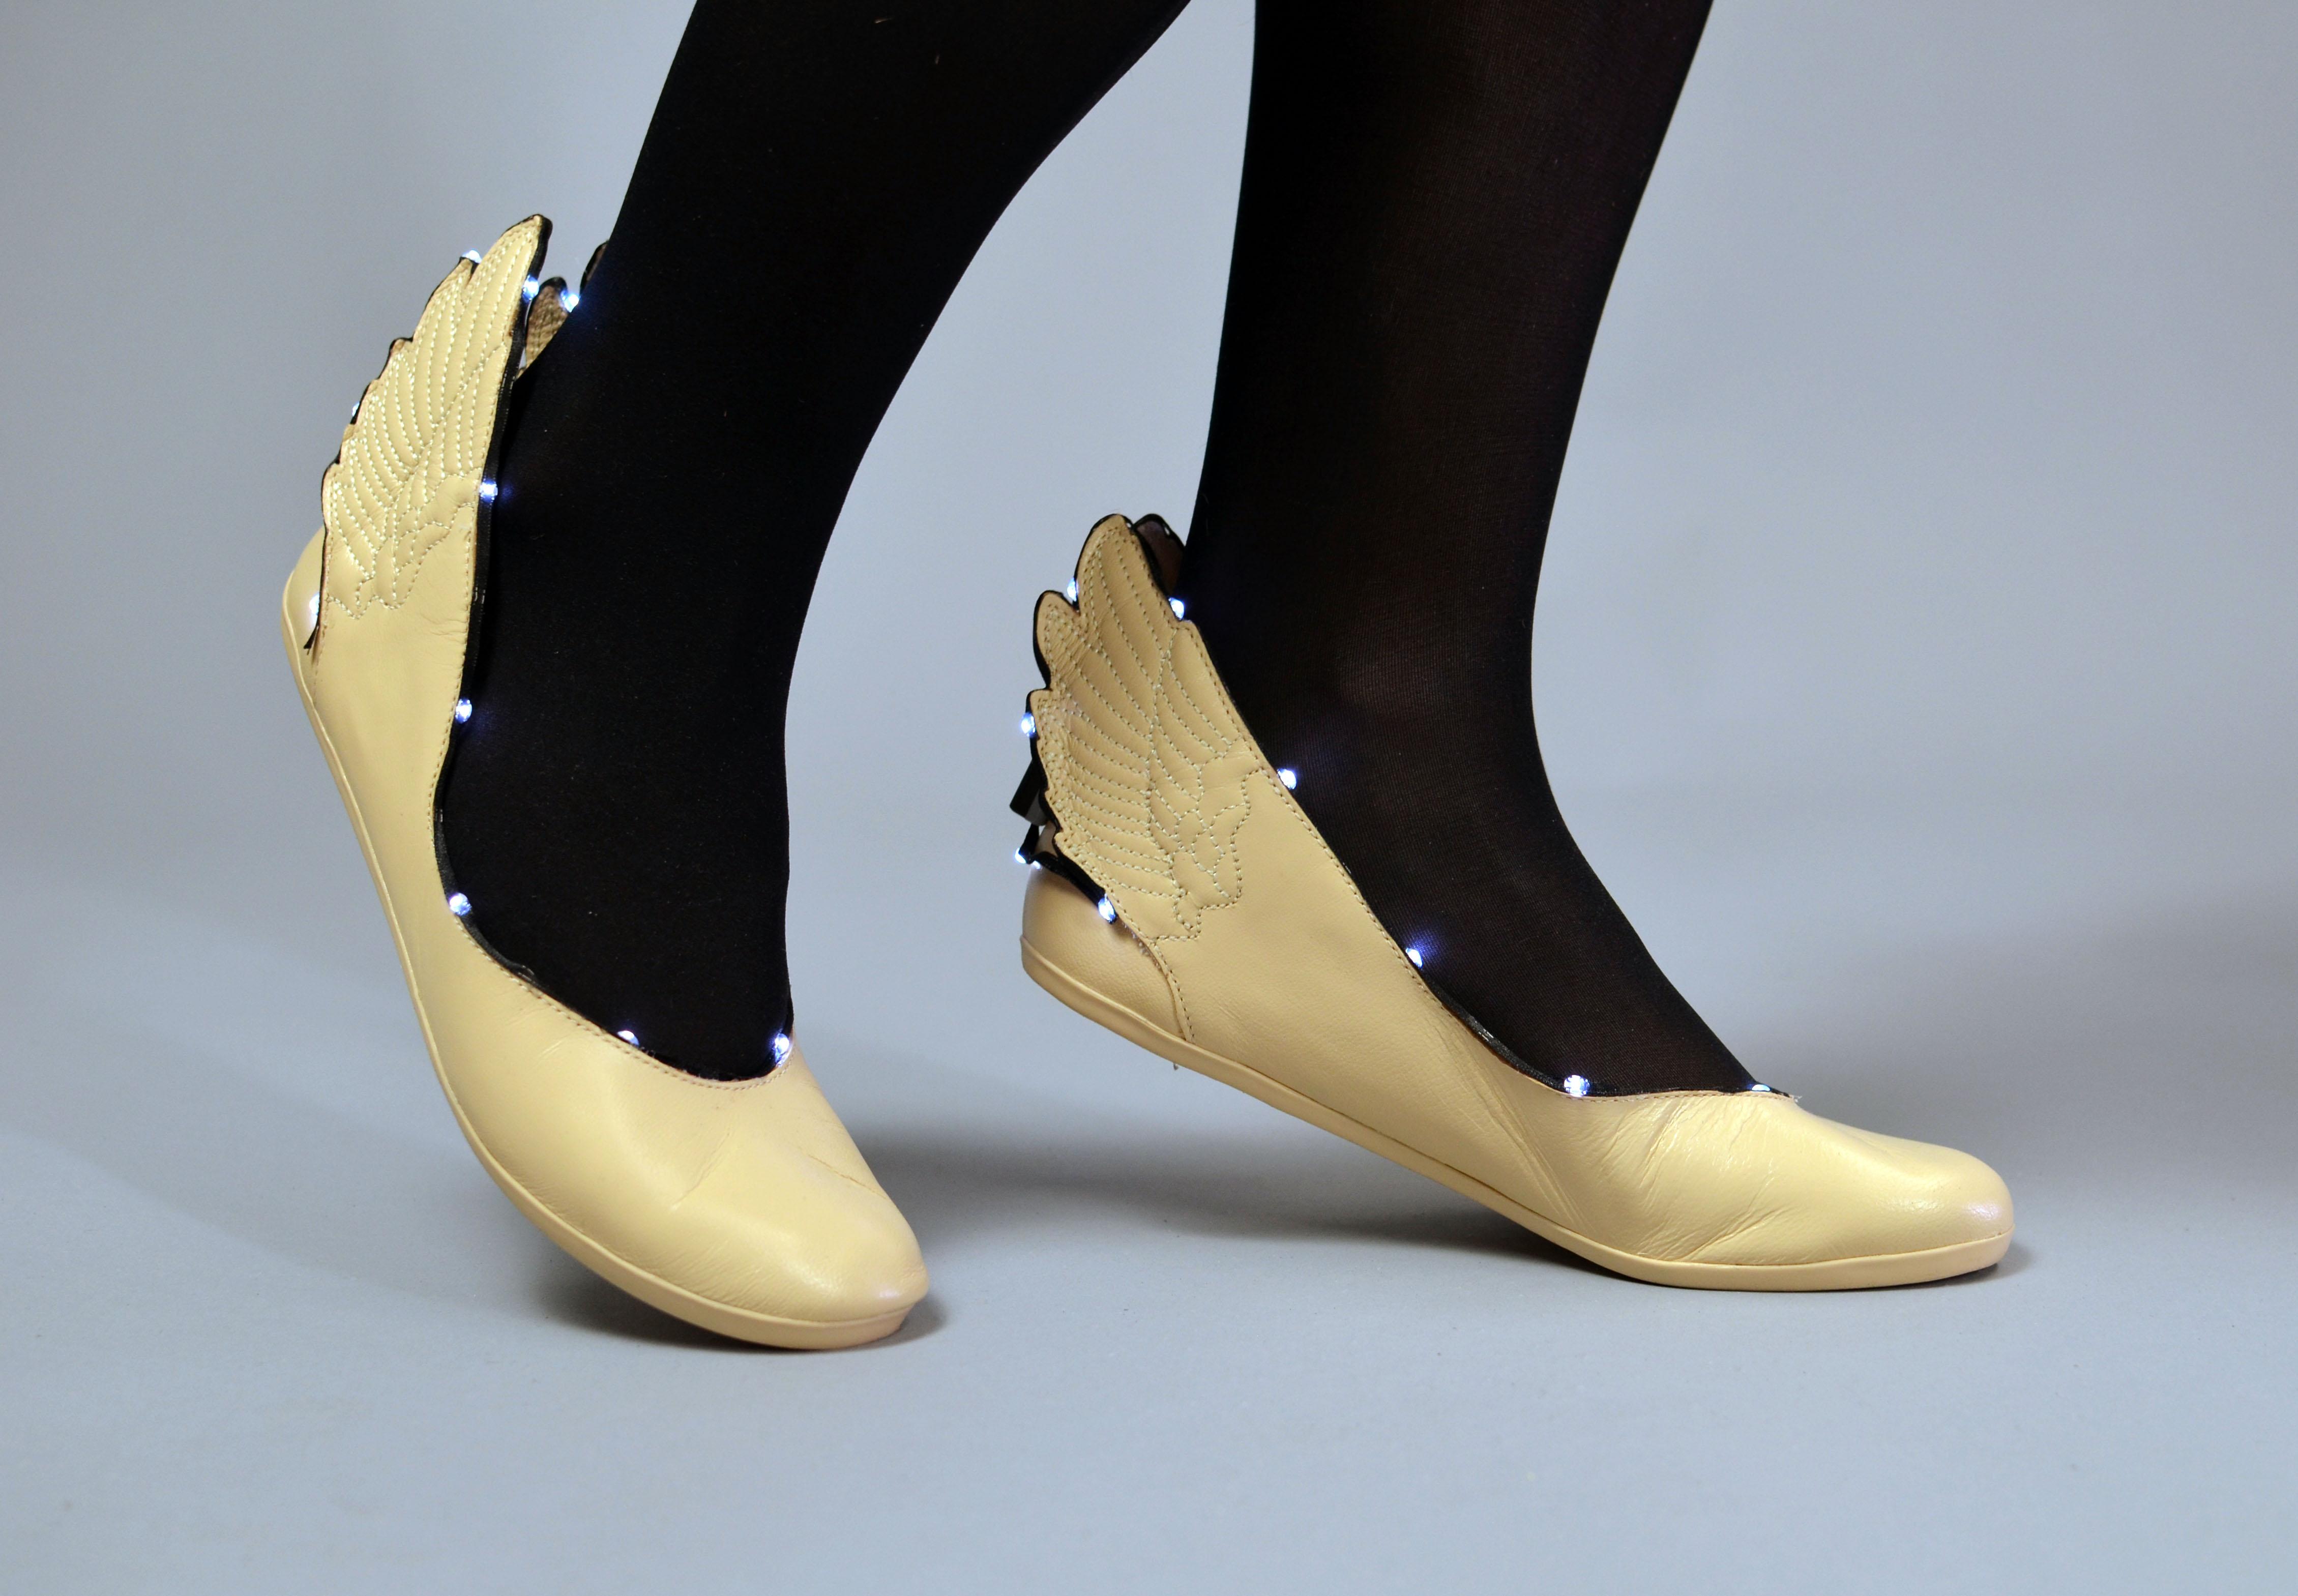 braincrafts_led-ribbon-shoes-adafruit-21.jpg